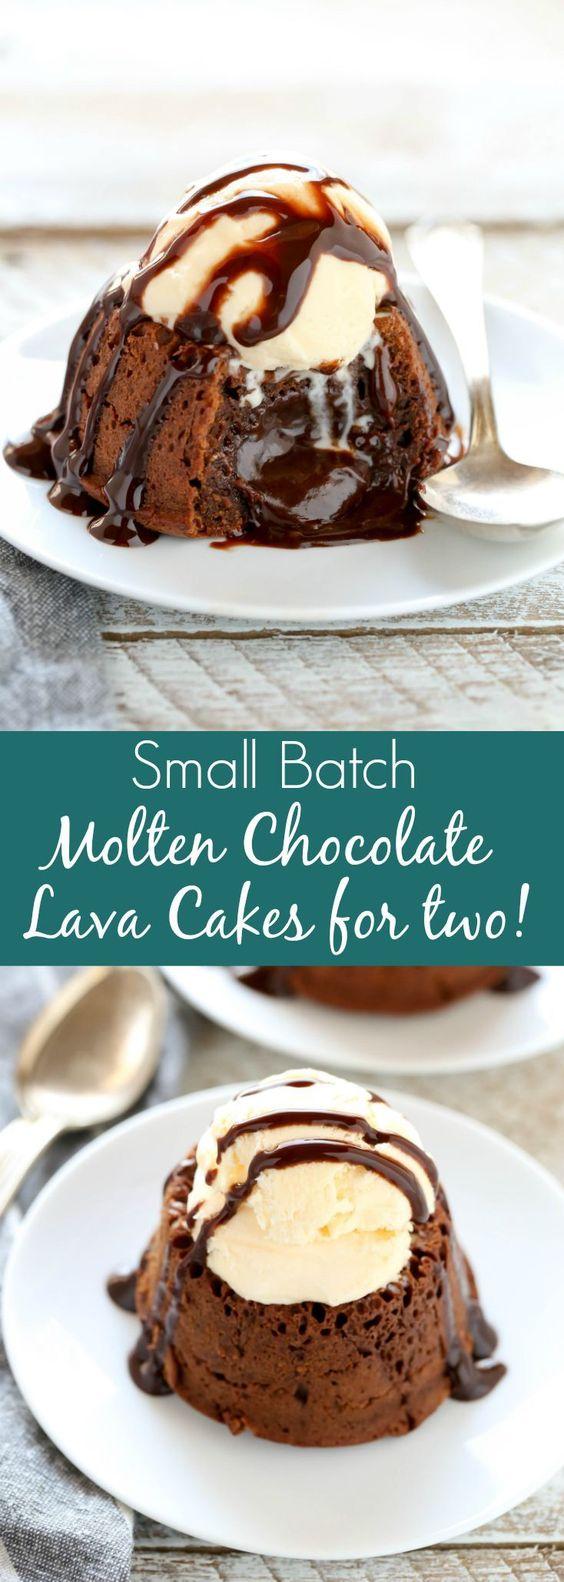 Molten Chocolate Lava Cakes For Two #cake #dessert